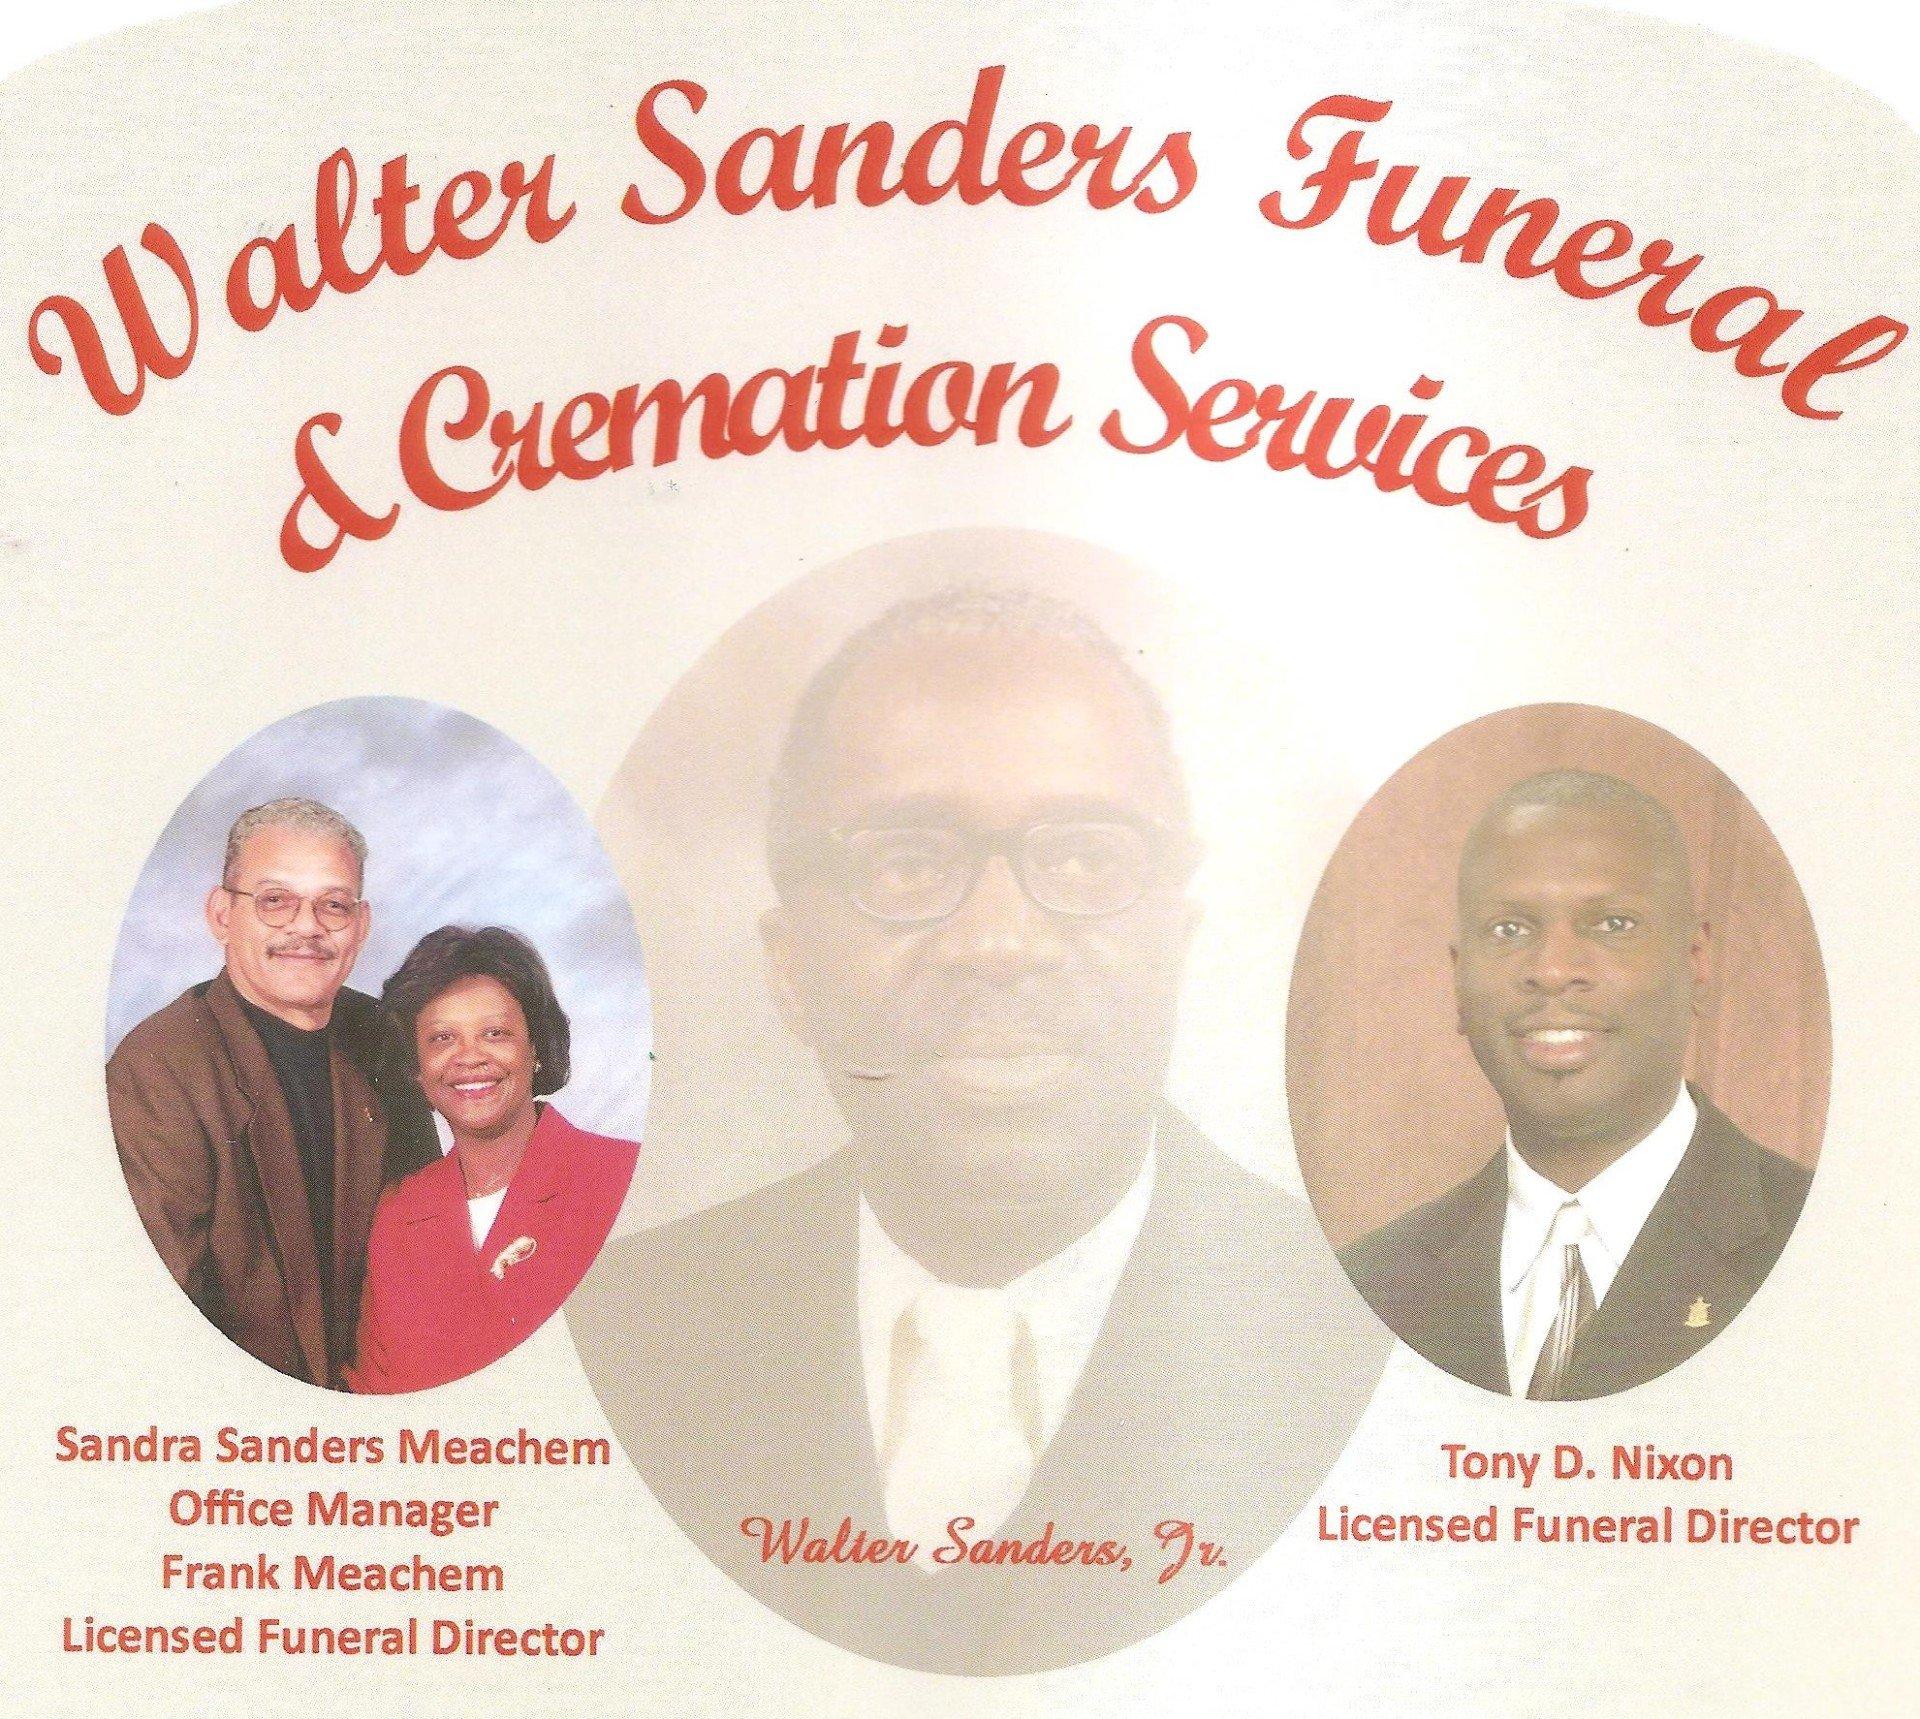 Obituaries | Smithfield, NC | Walter Sanders Funeral